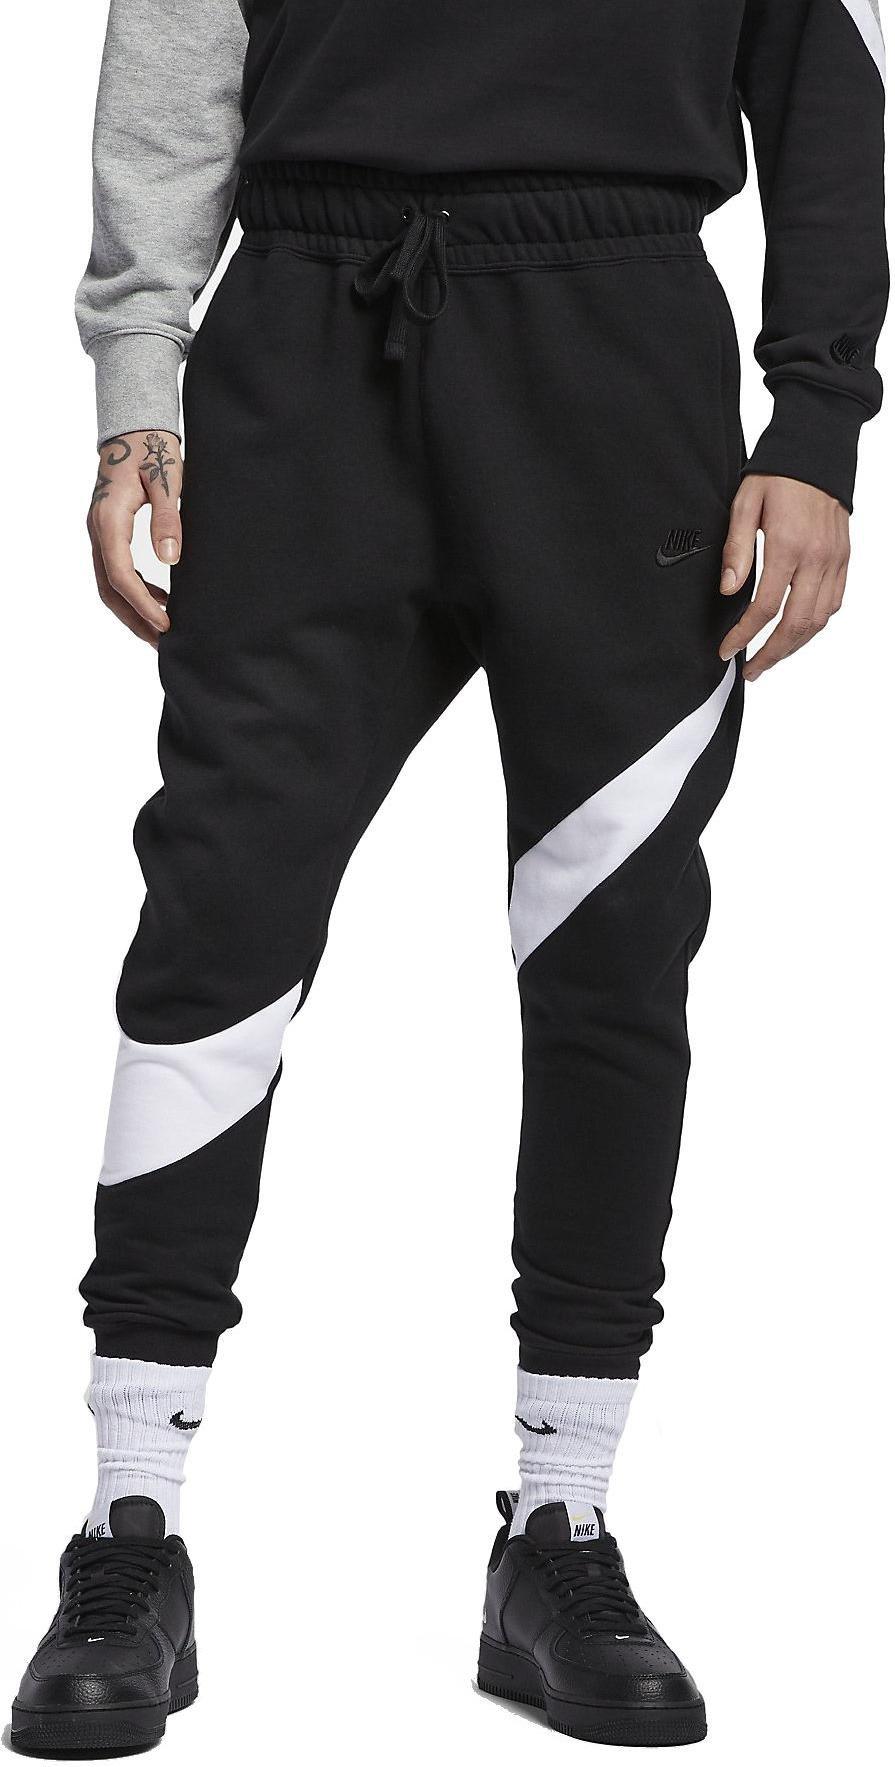 a pesar de Rebotar Conceder  Pants Nike M NSW HBR PANT BB STMT - Top4Running.com